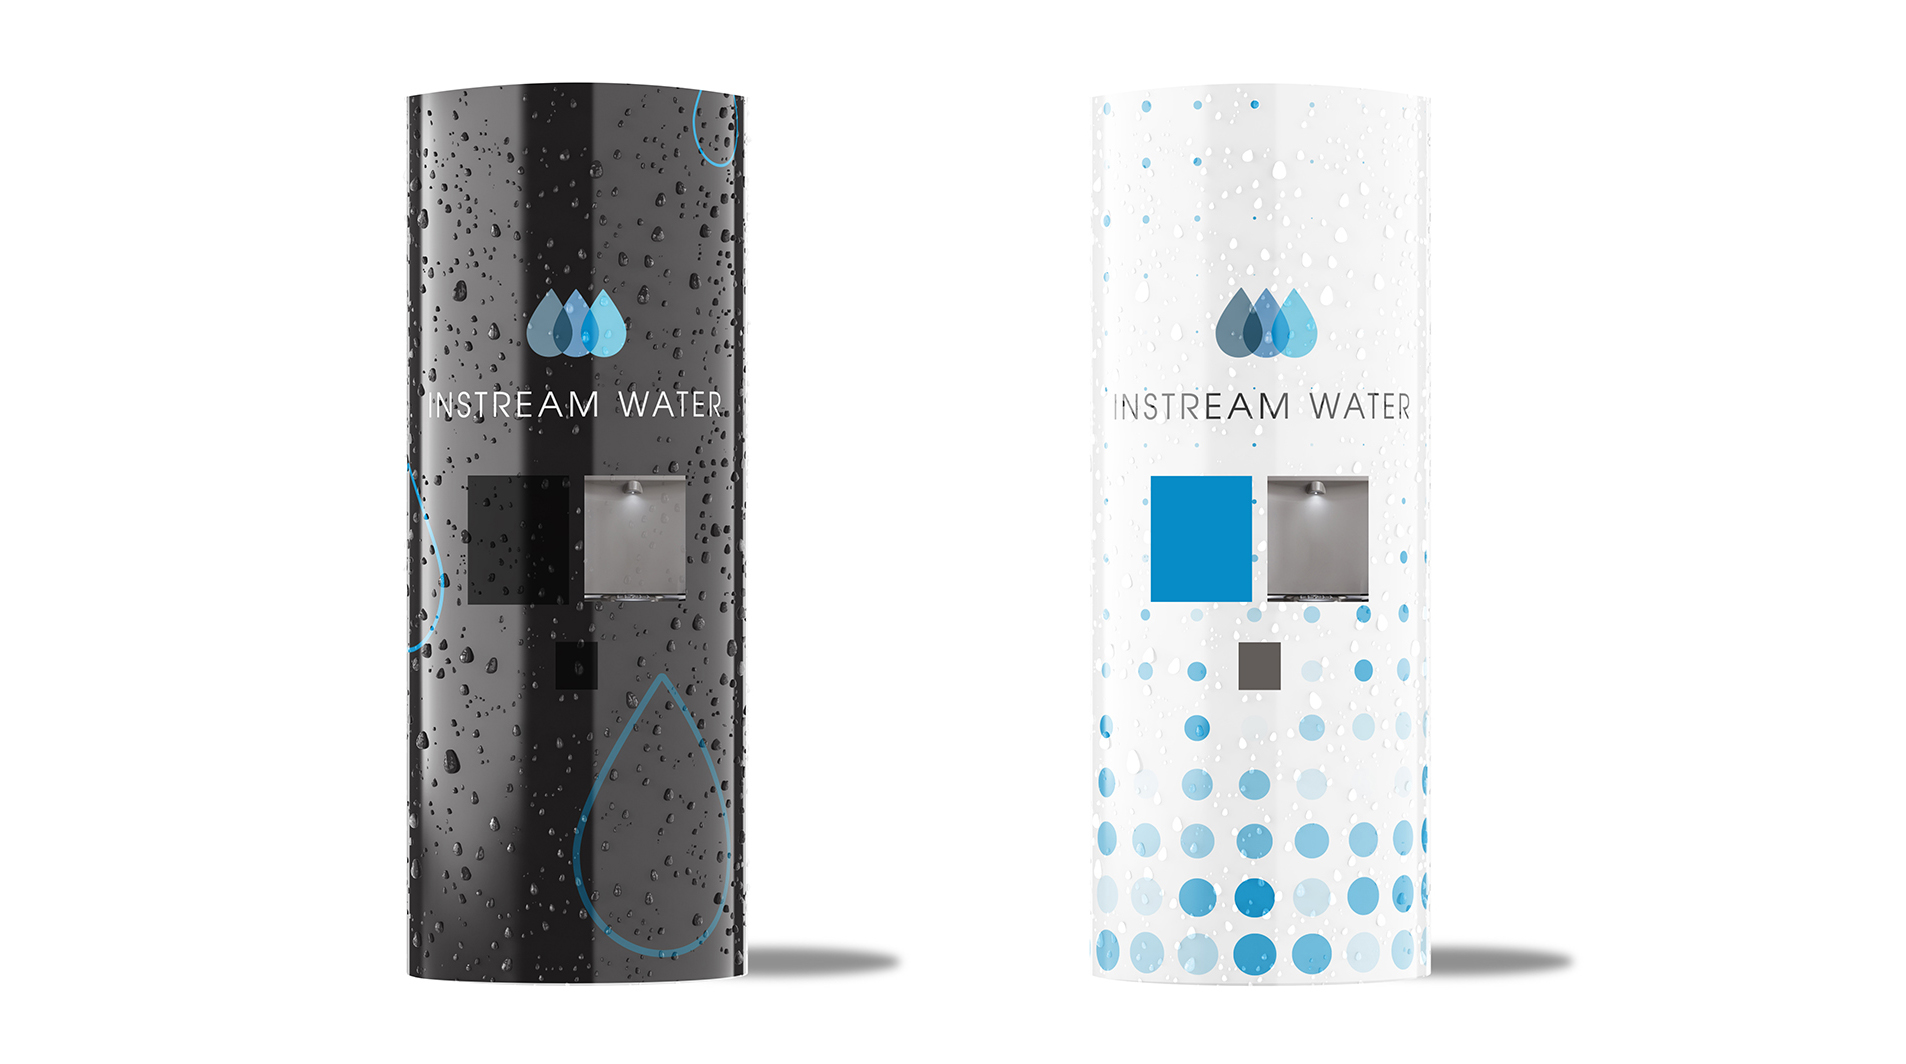 instream water dispensor design